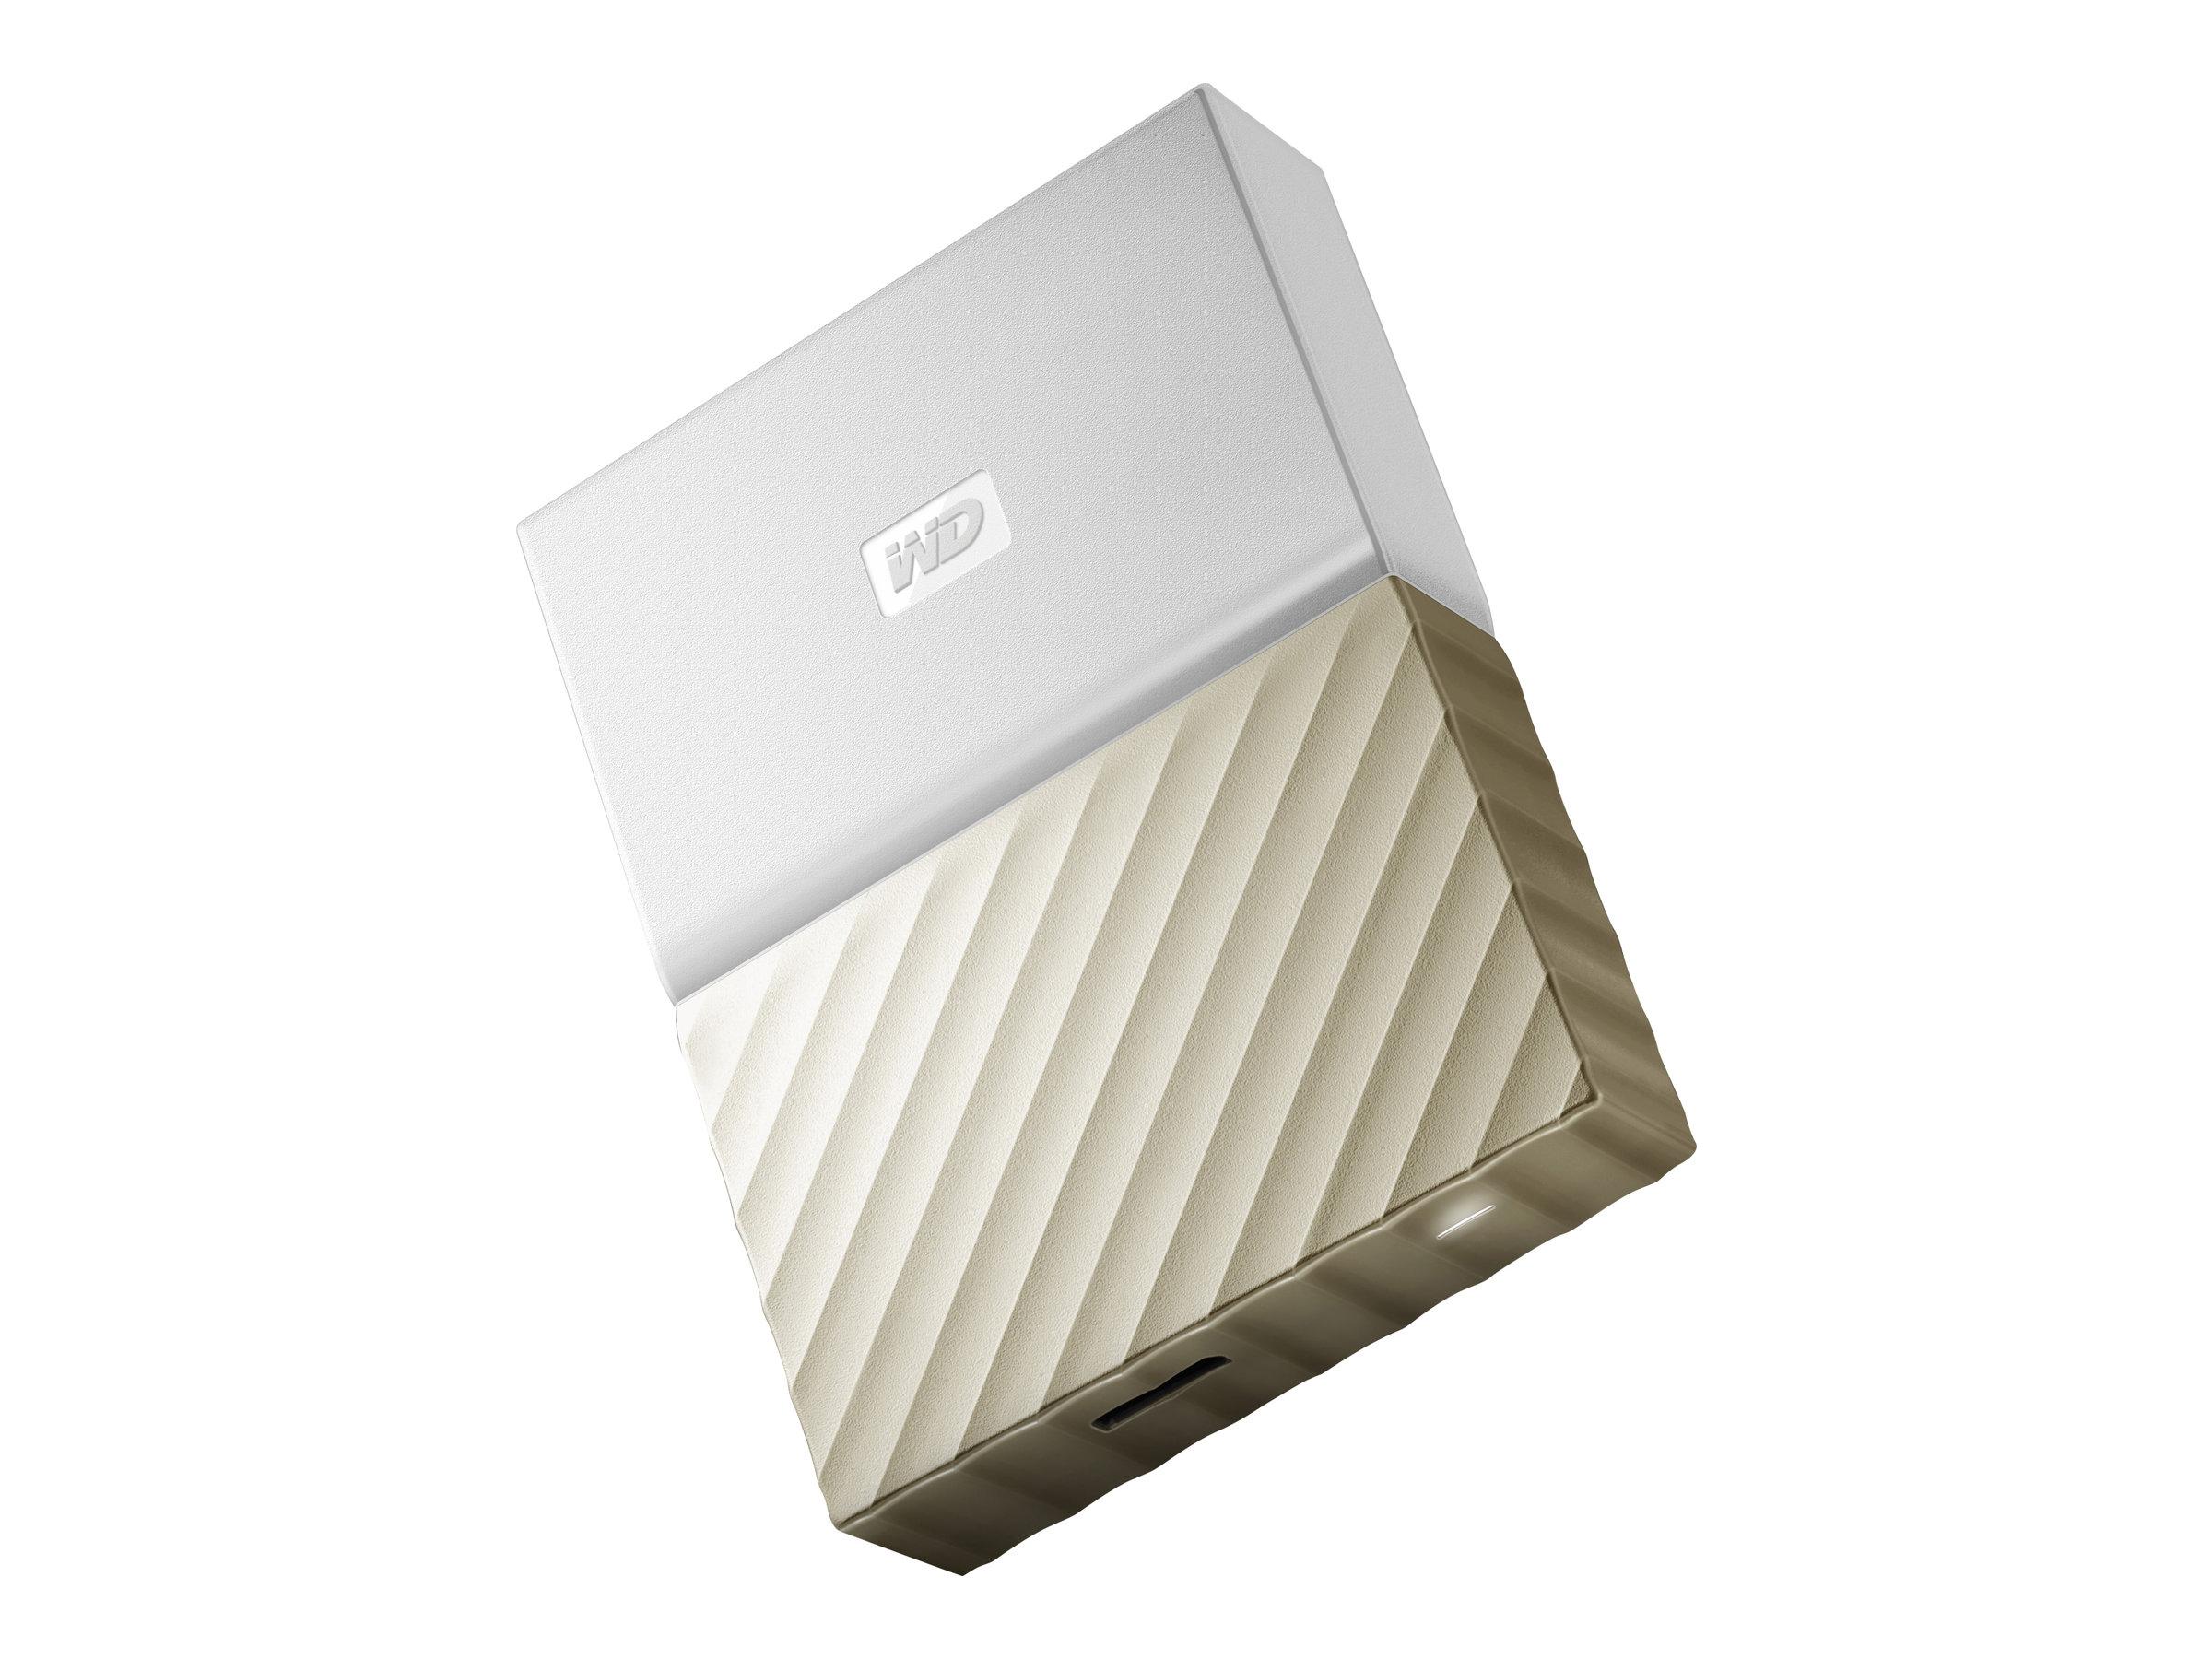 WD My Passport Ultra WDBFKT0040BGD Festplatte - verschlüsselt - 4 TB - extern (tragbar) - USB 3.0 - 256-Bit-AES - Weißgold